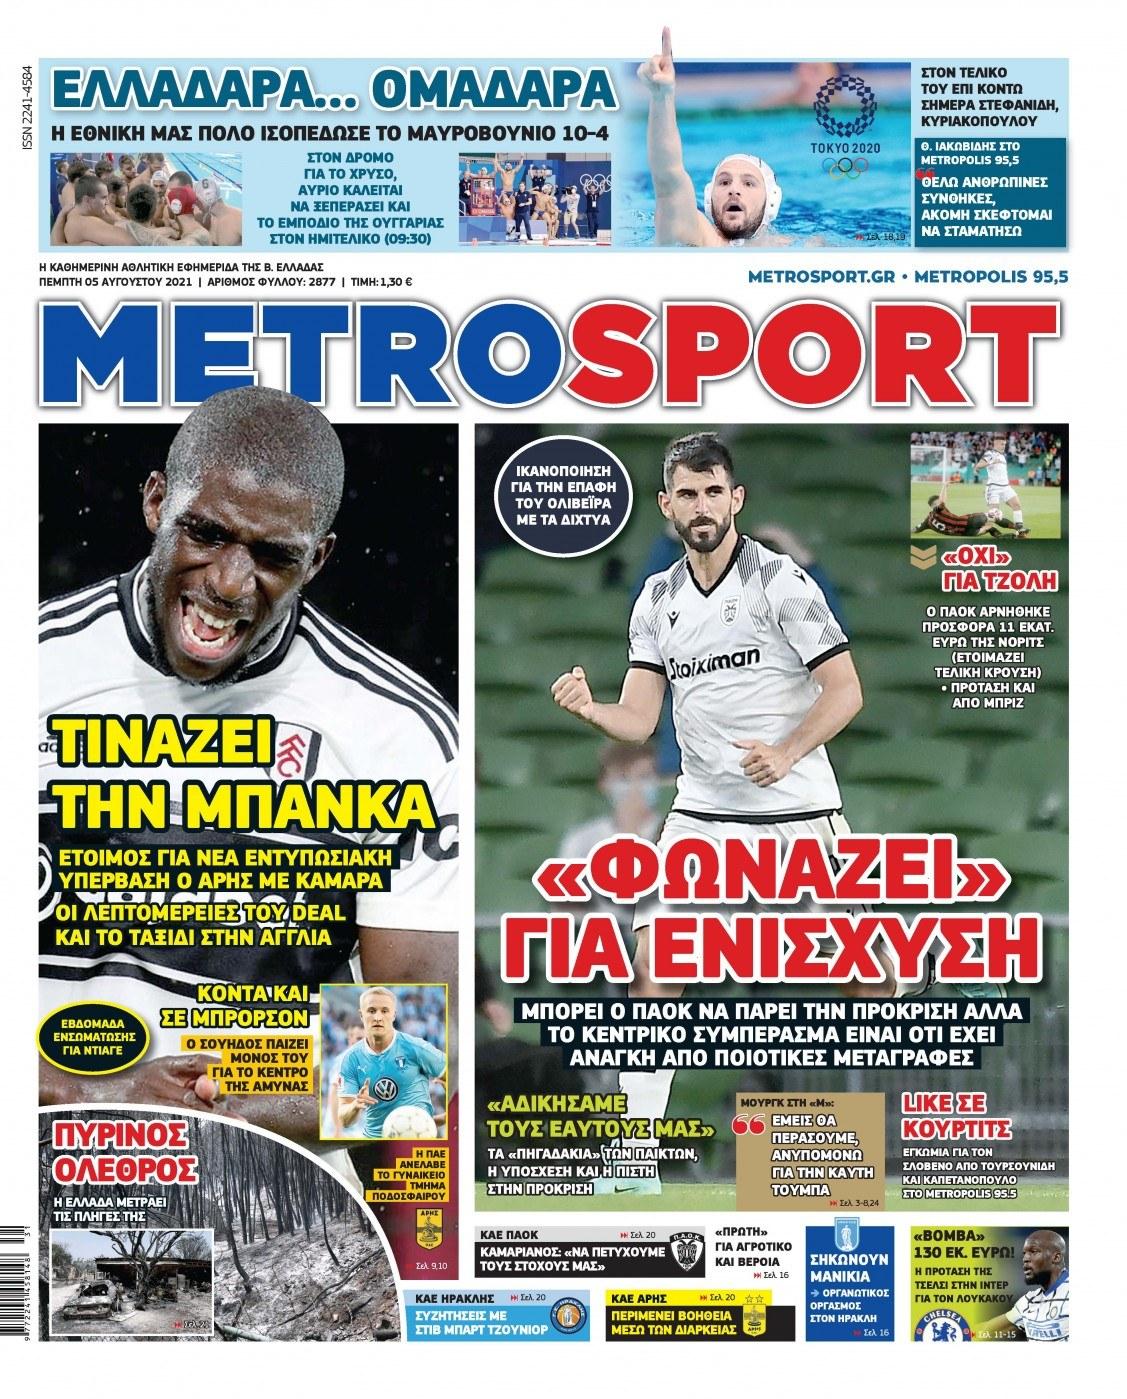 Metrosport 5.8